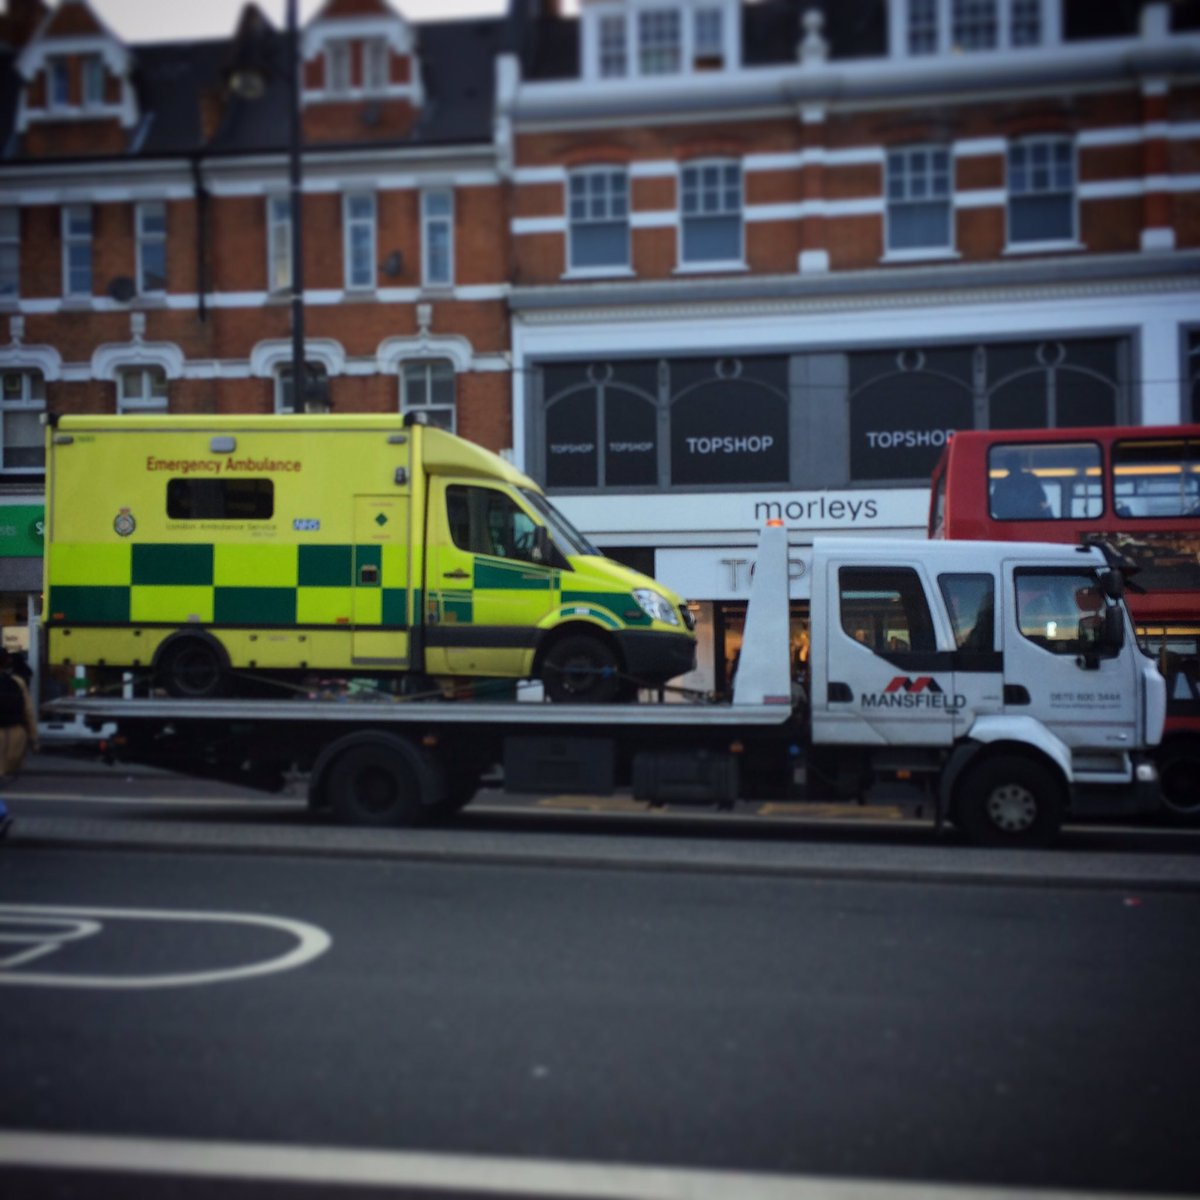 The ambulance ambulance... https://t.co/DEFSRDT8Cj